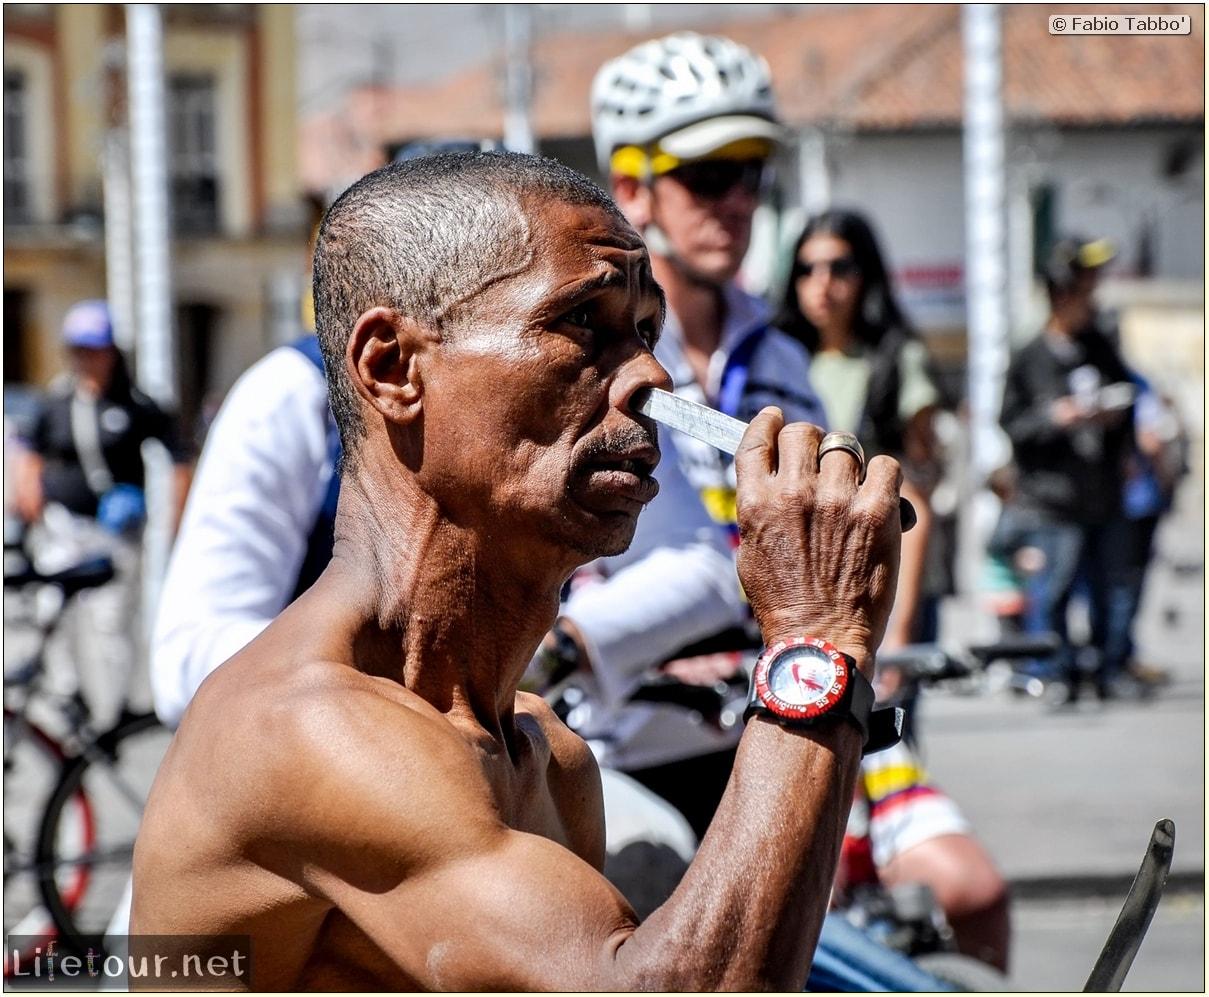 Fabio_s-LifeTour---Colombia-(2015-January-February)---Bogota_---Candelaria---Street-entertainment-in-Bogot…---4138